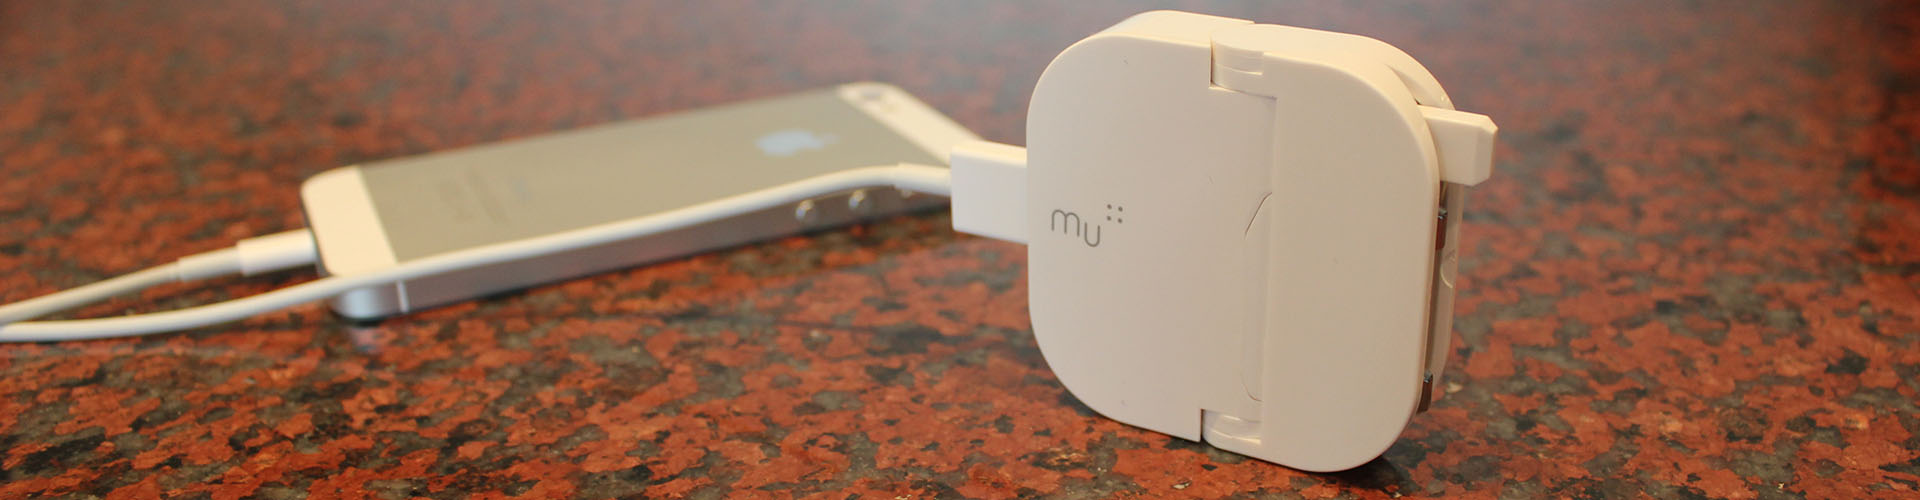 The MU Foldable Plug: Probably The Coolest Plug Ever